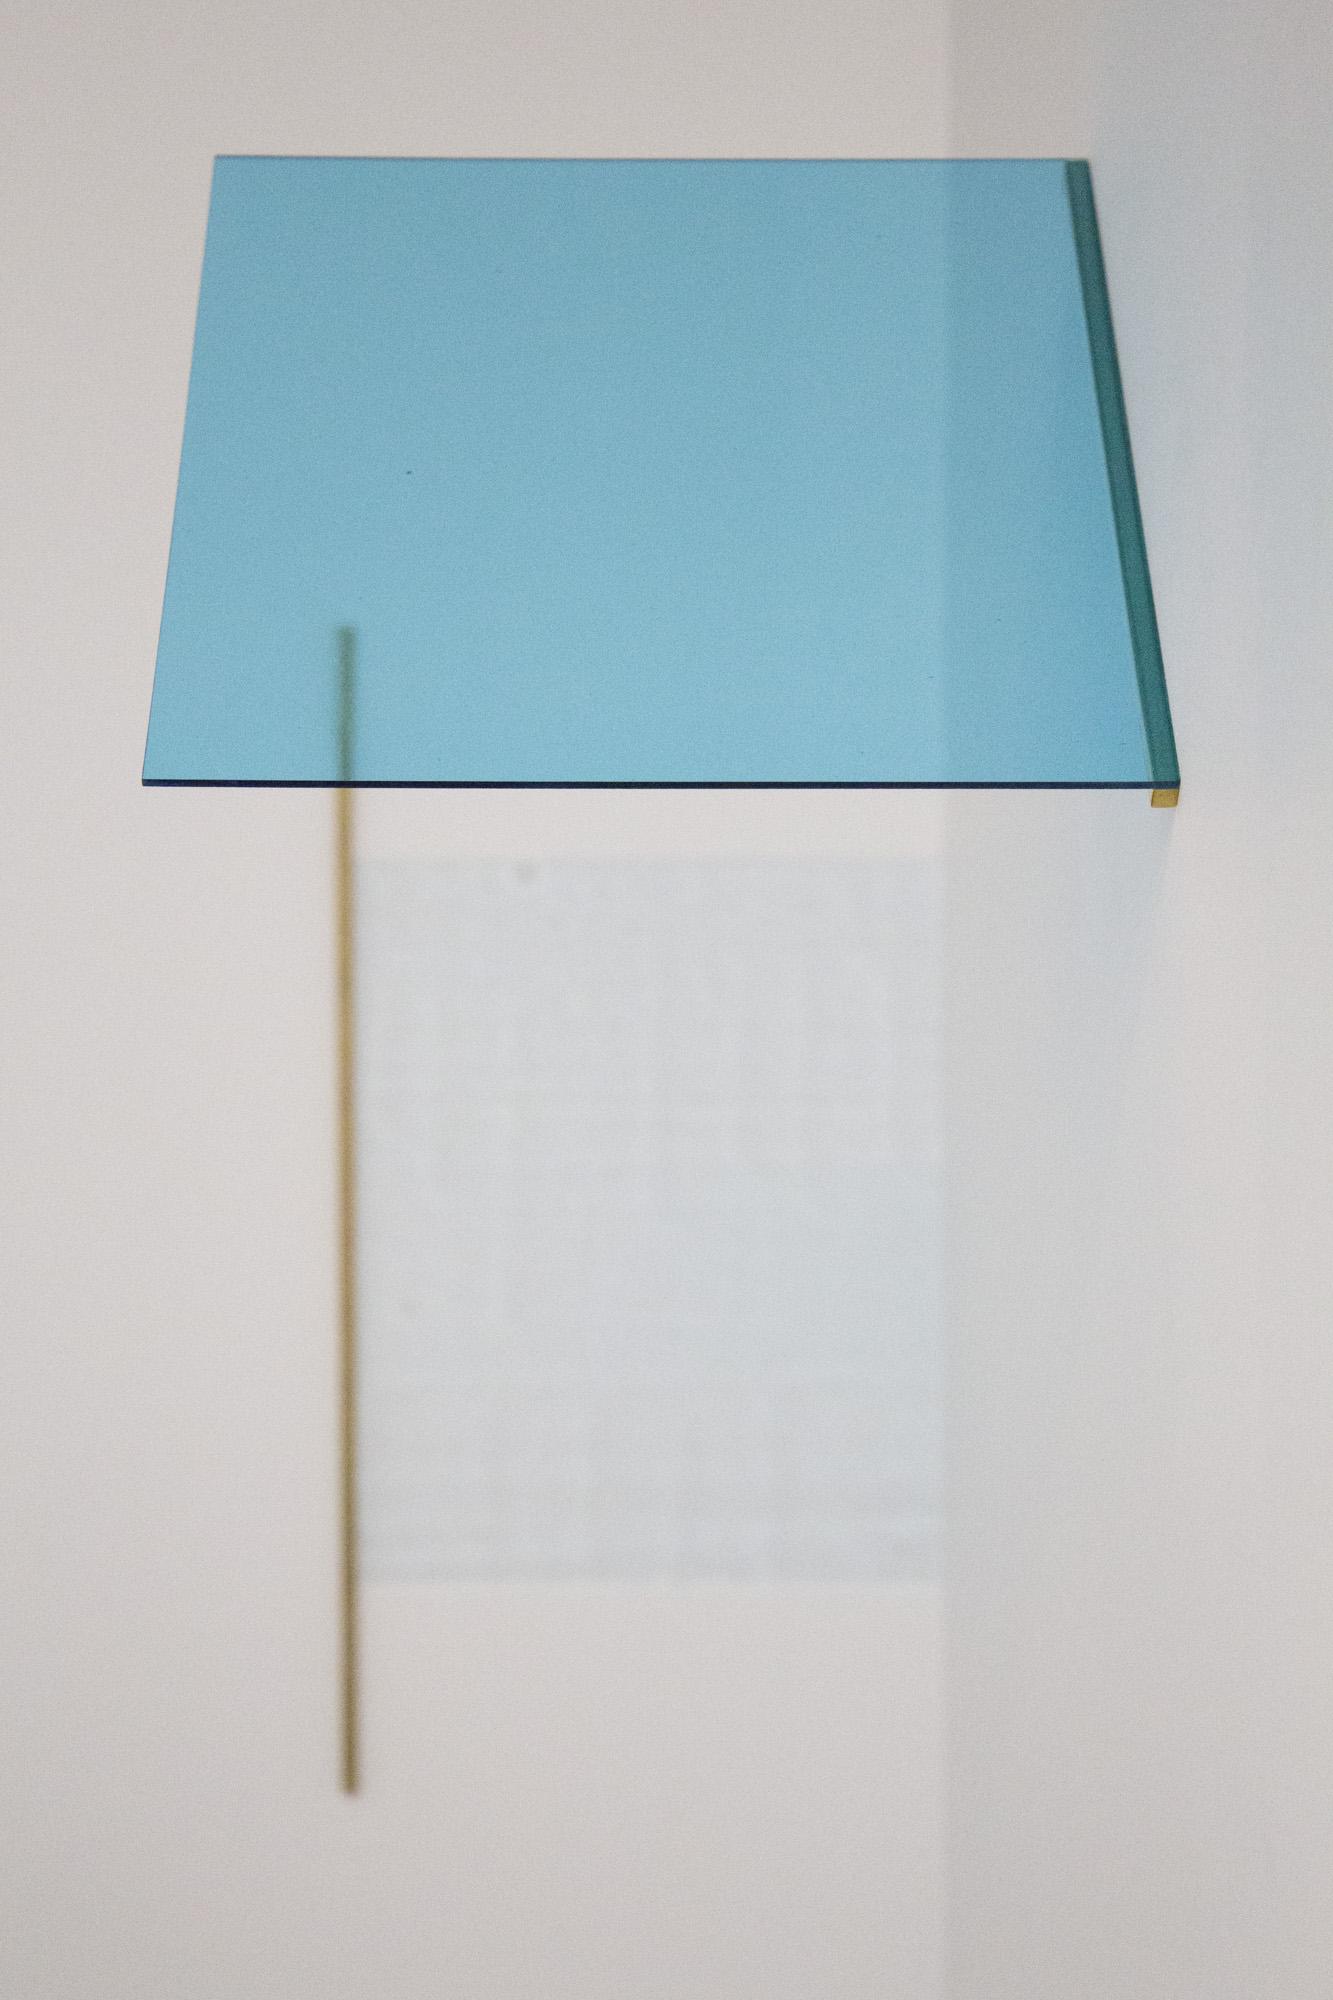 Sarah Smuts-Kennedy,  Subtle Field 1  (detail), 2014